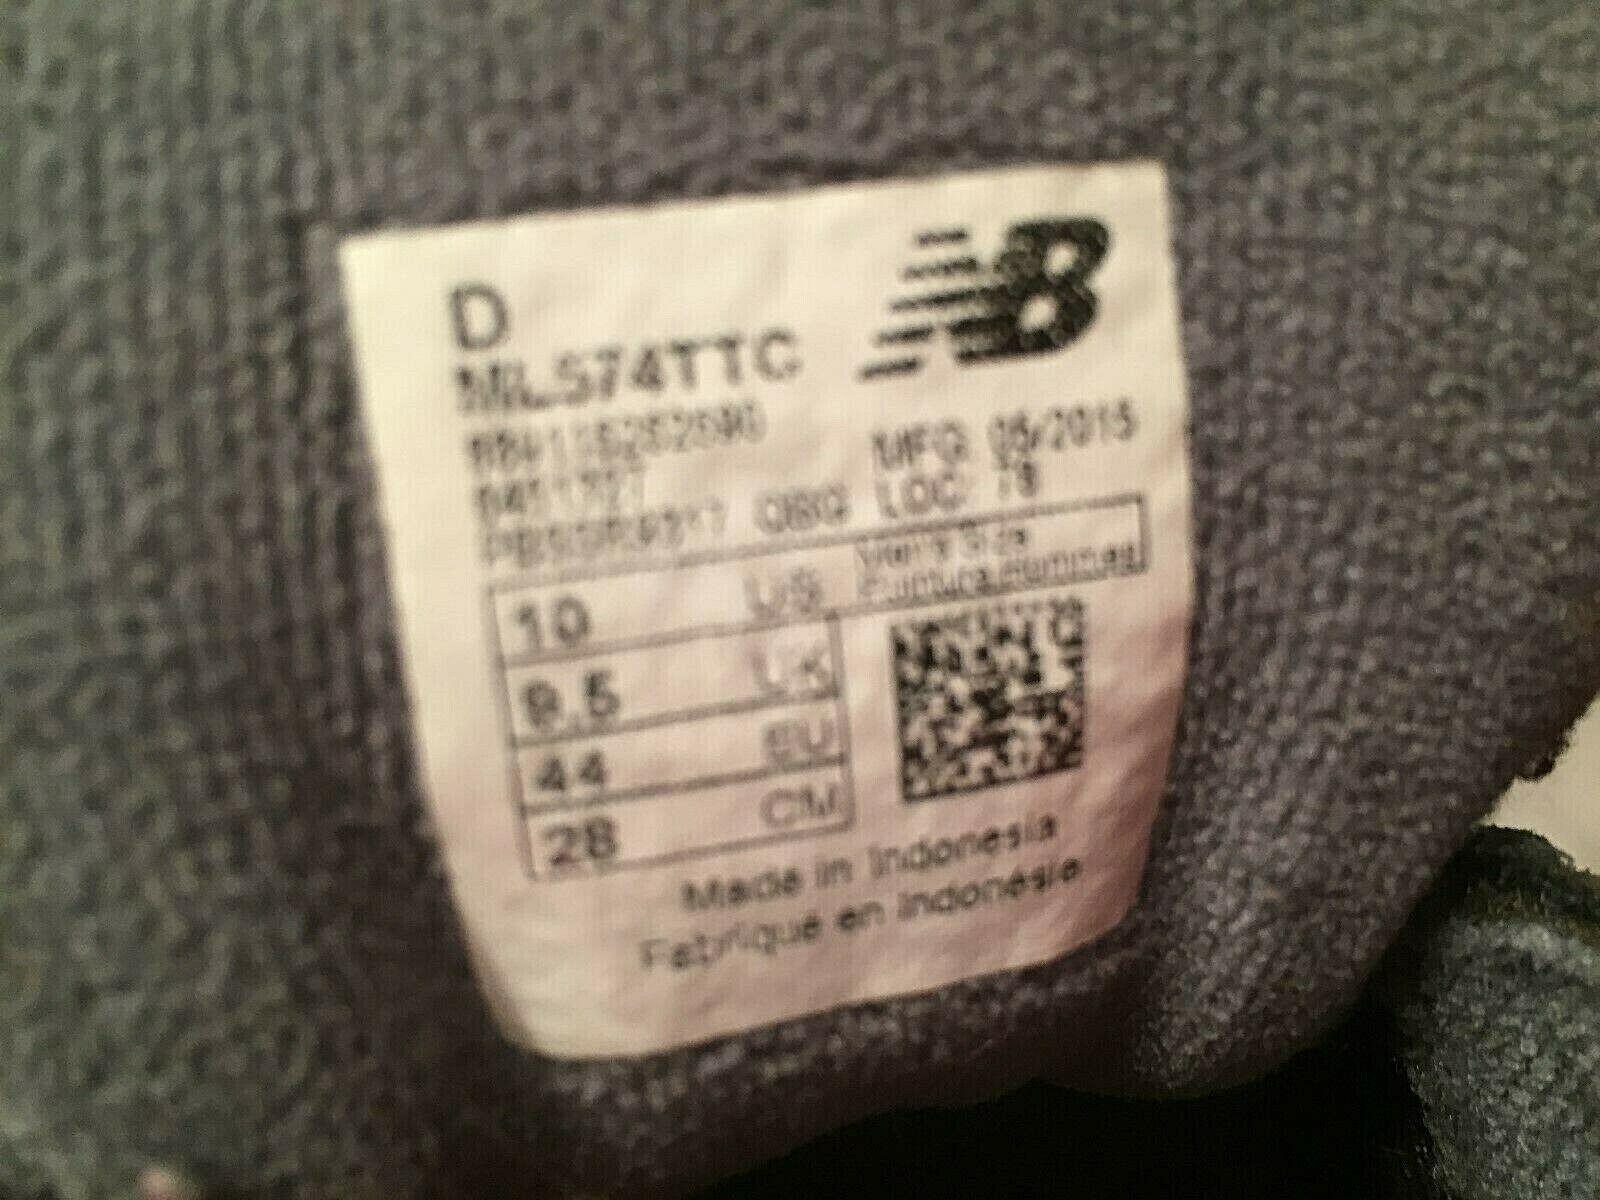 New Balance Men's 574 ML574TTC Gray Sweatshirt Sneakers Trainers Size 10 D